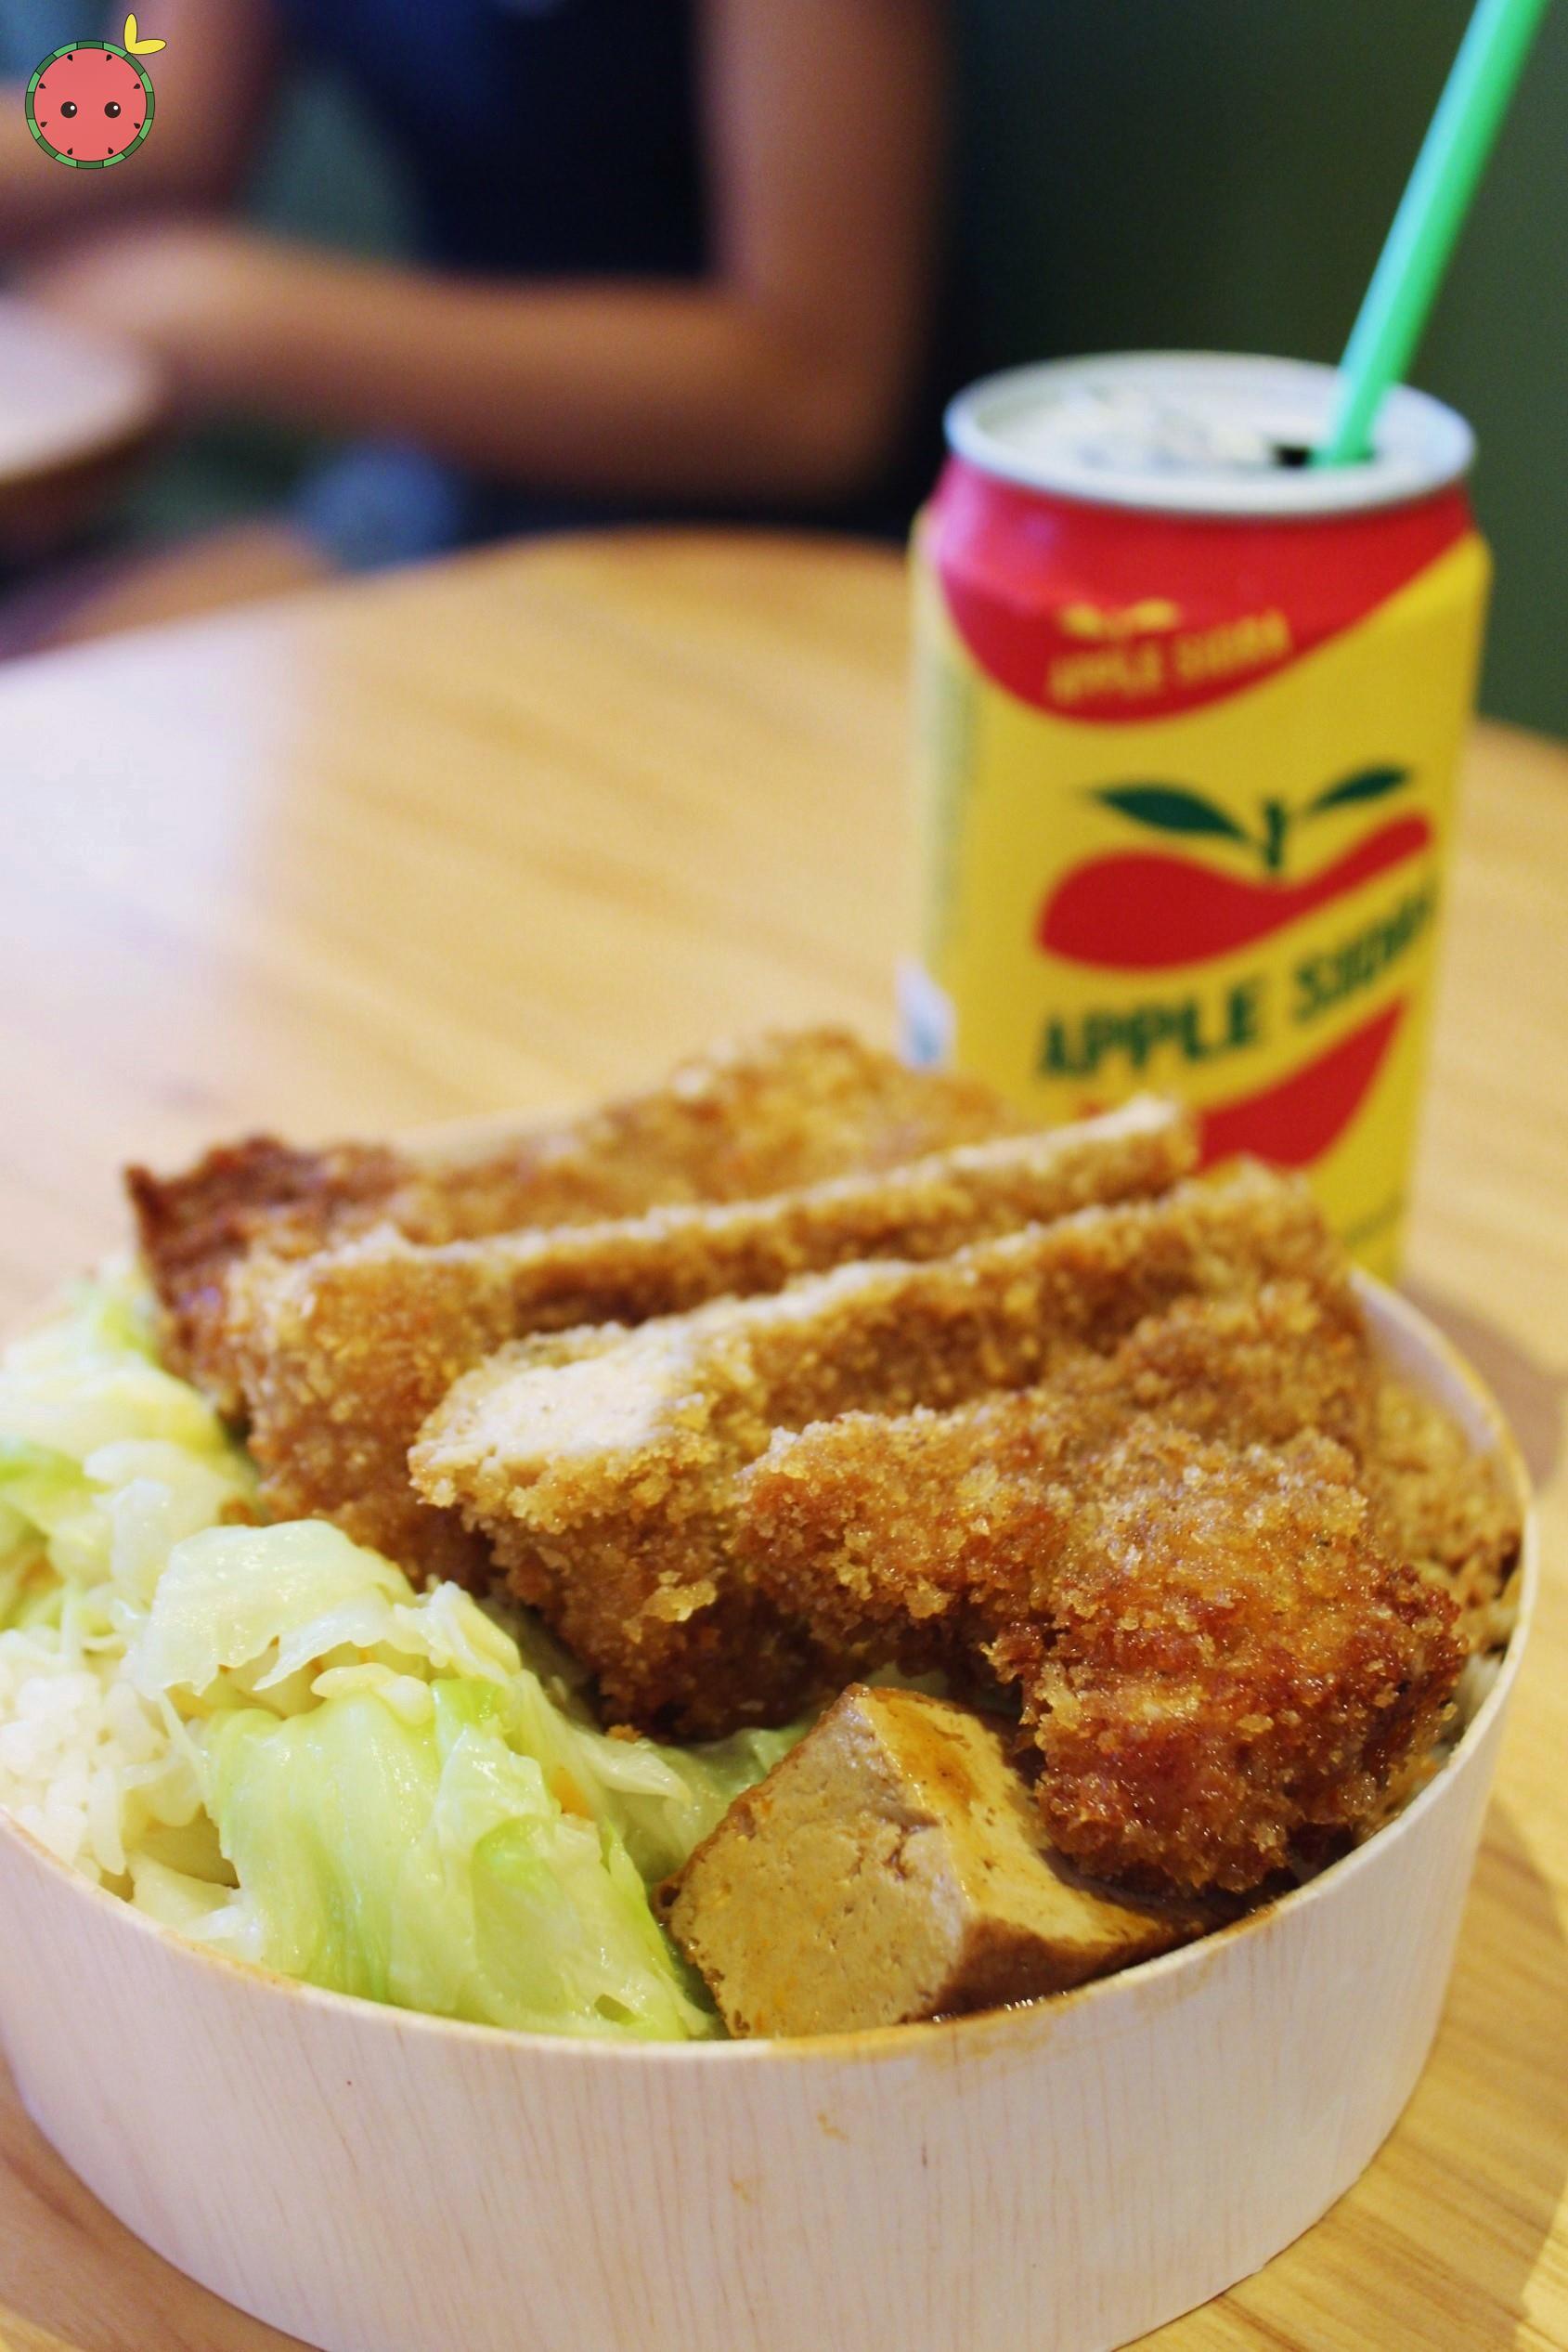 Golden crust pork chop bento box